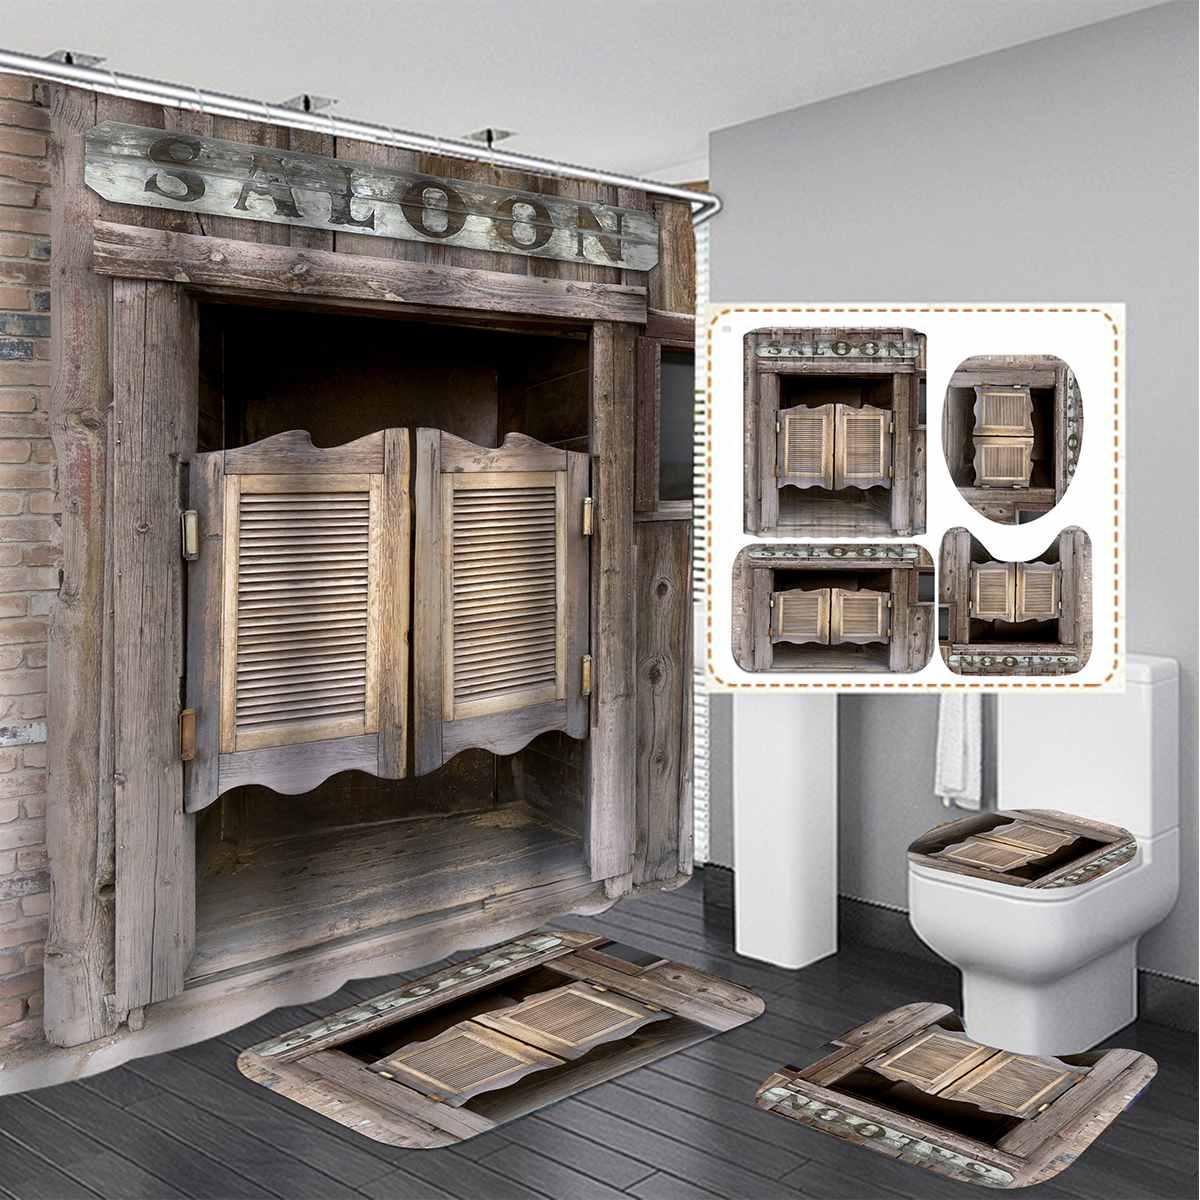 3d Rustic Vintage Old Wooden Door Waterproof Bath Shower Curtain Anti Slip Bathroom Rugs Set Kitchen Bath Mat Toilet Cover Shower Curtains Aliexpress